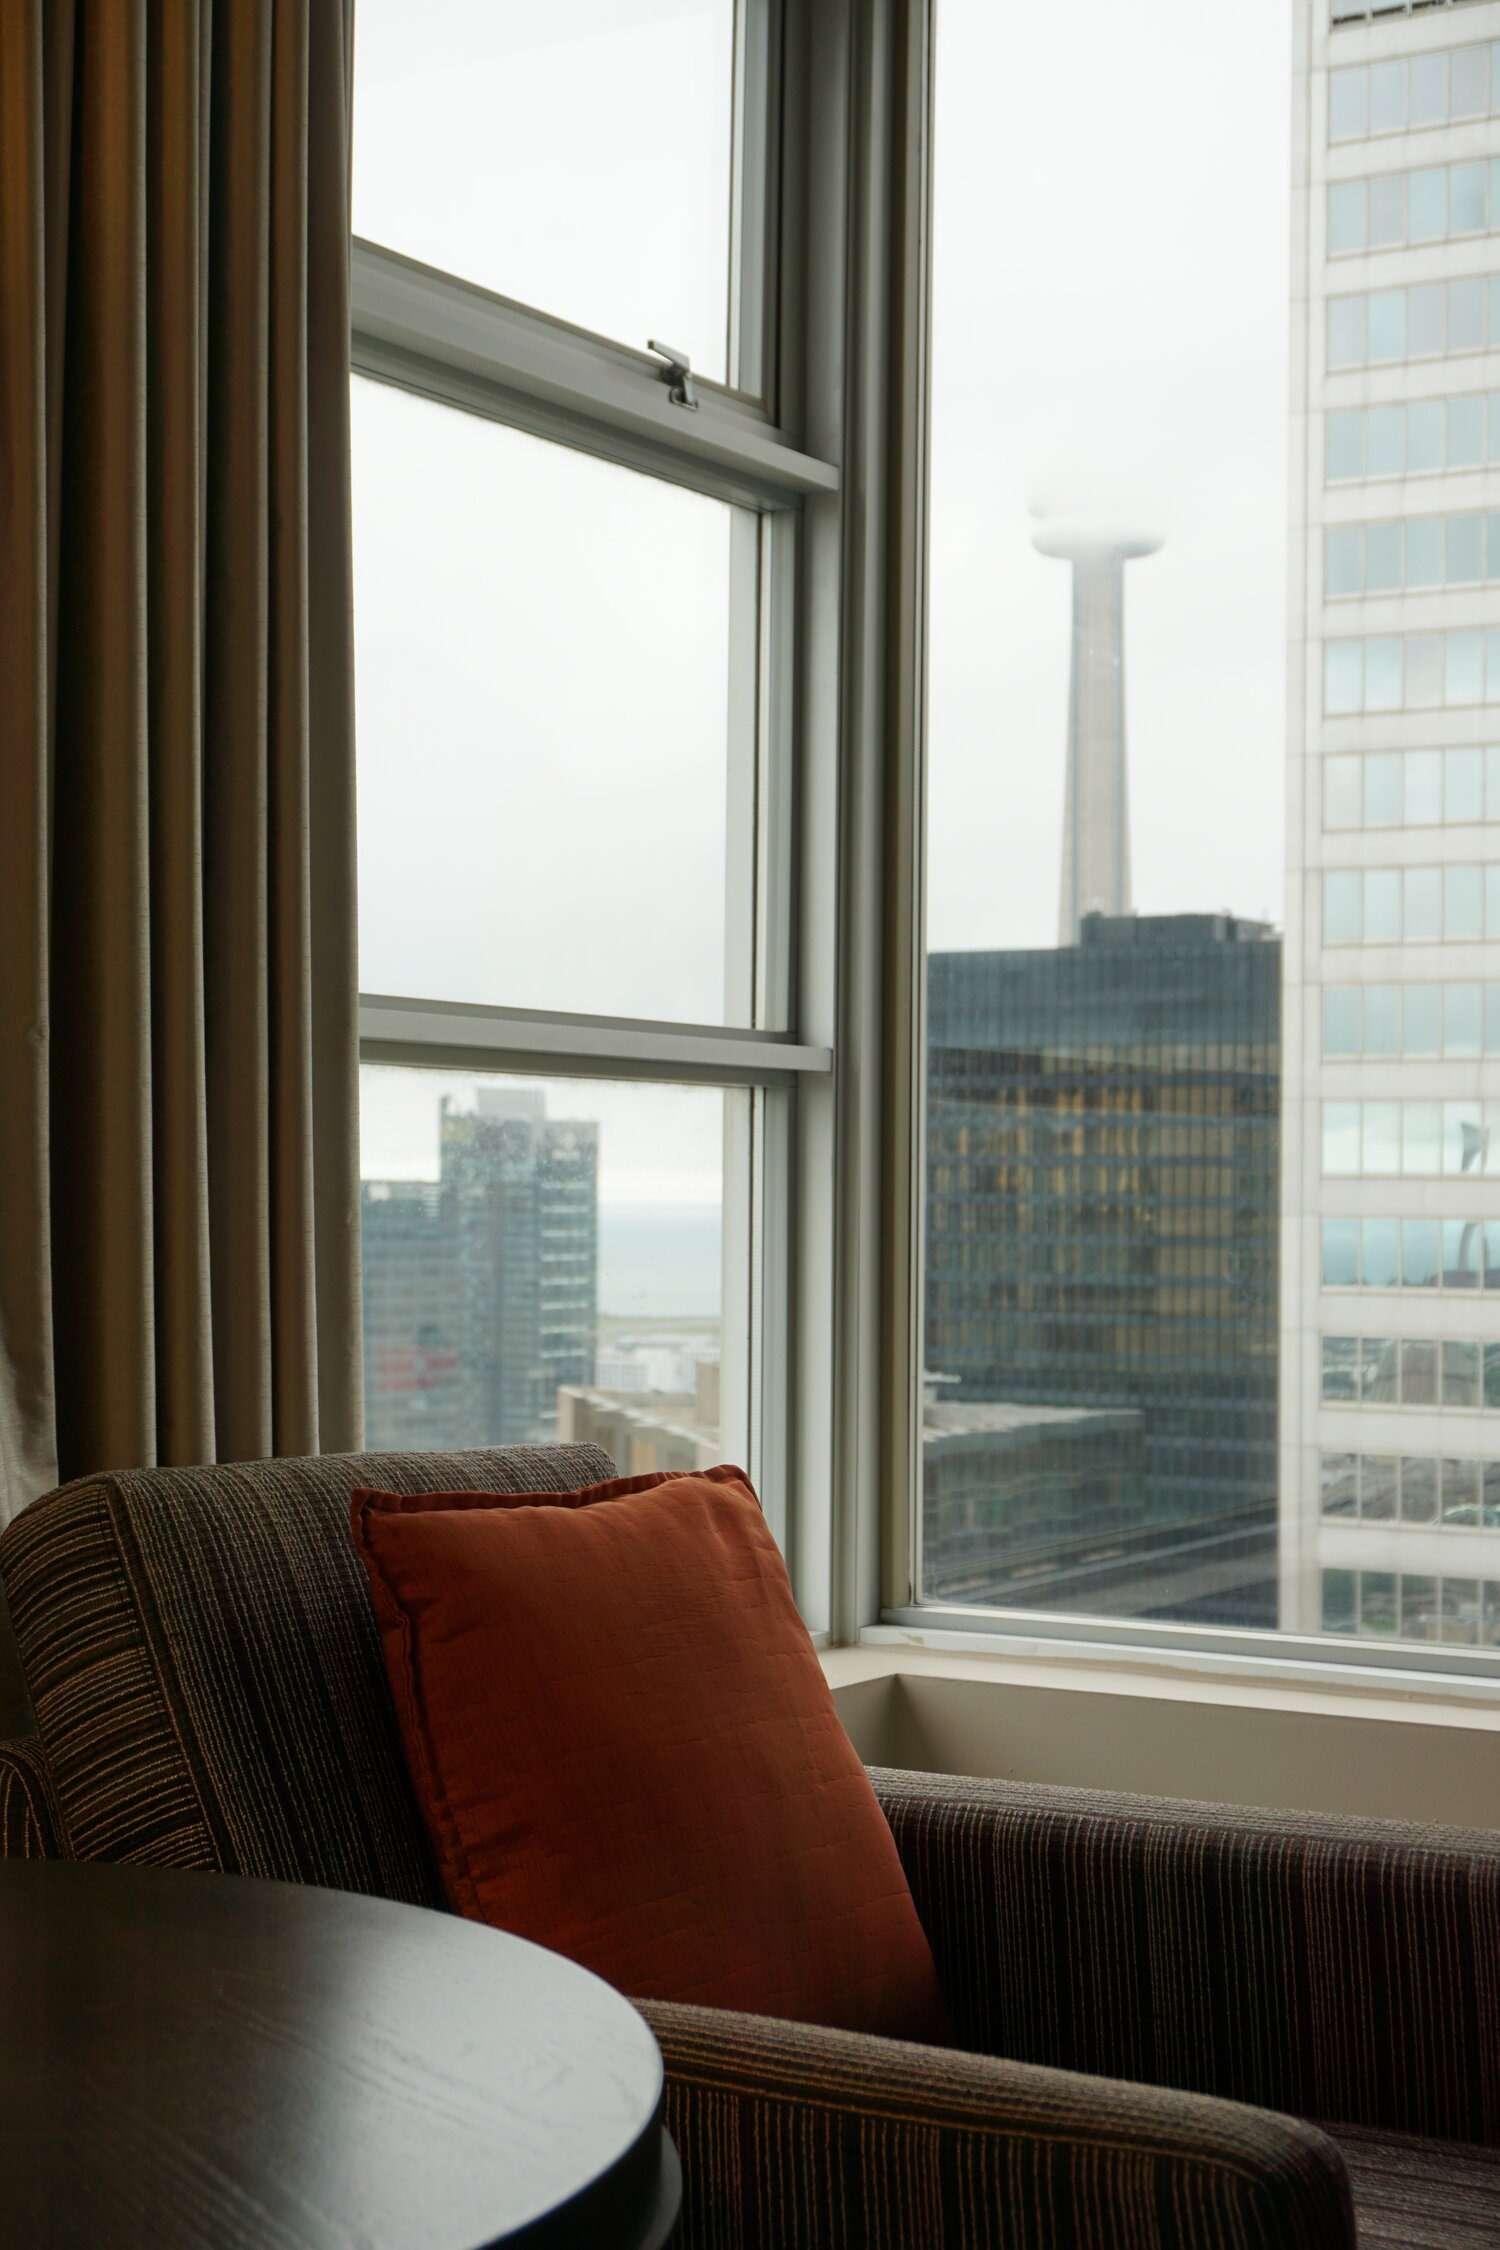 Window seat in One King West hotel room